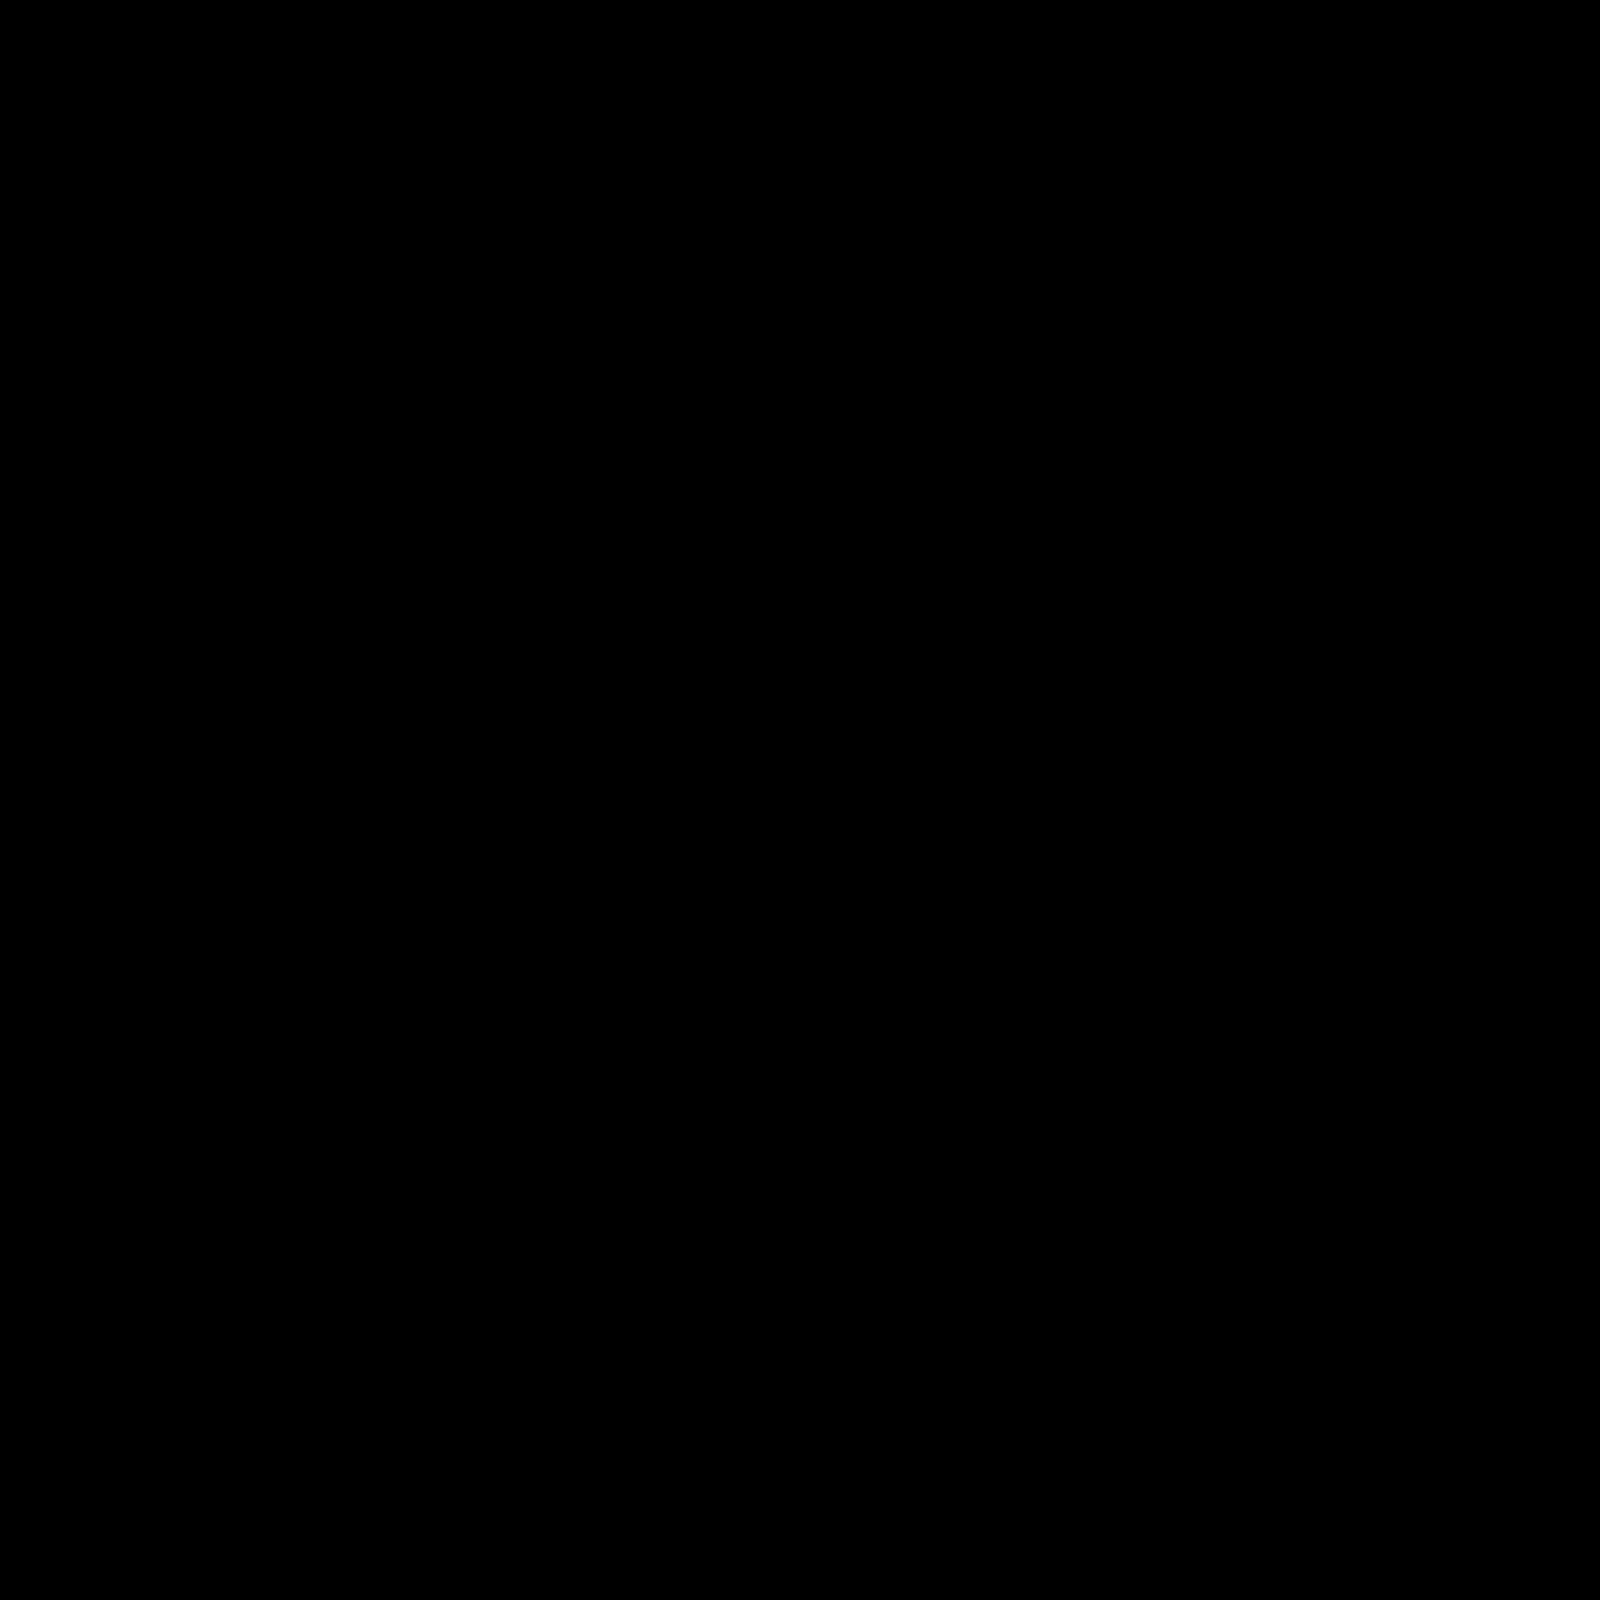 Empty Battery icon